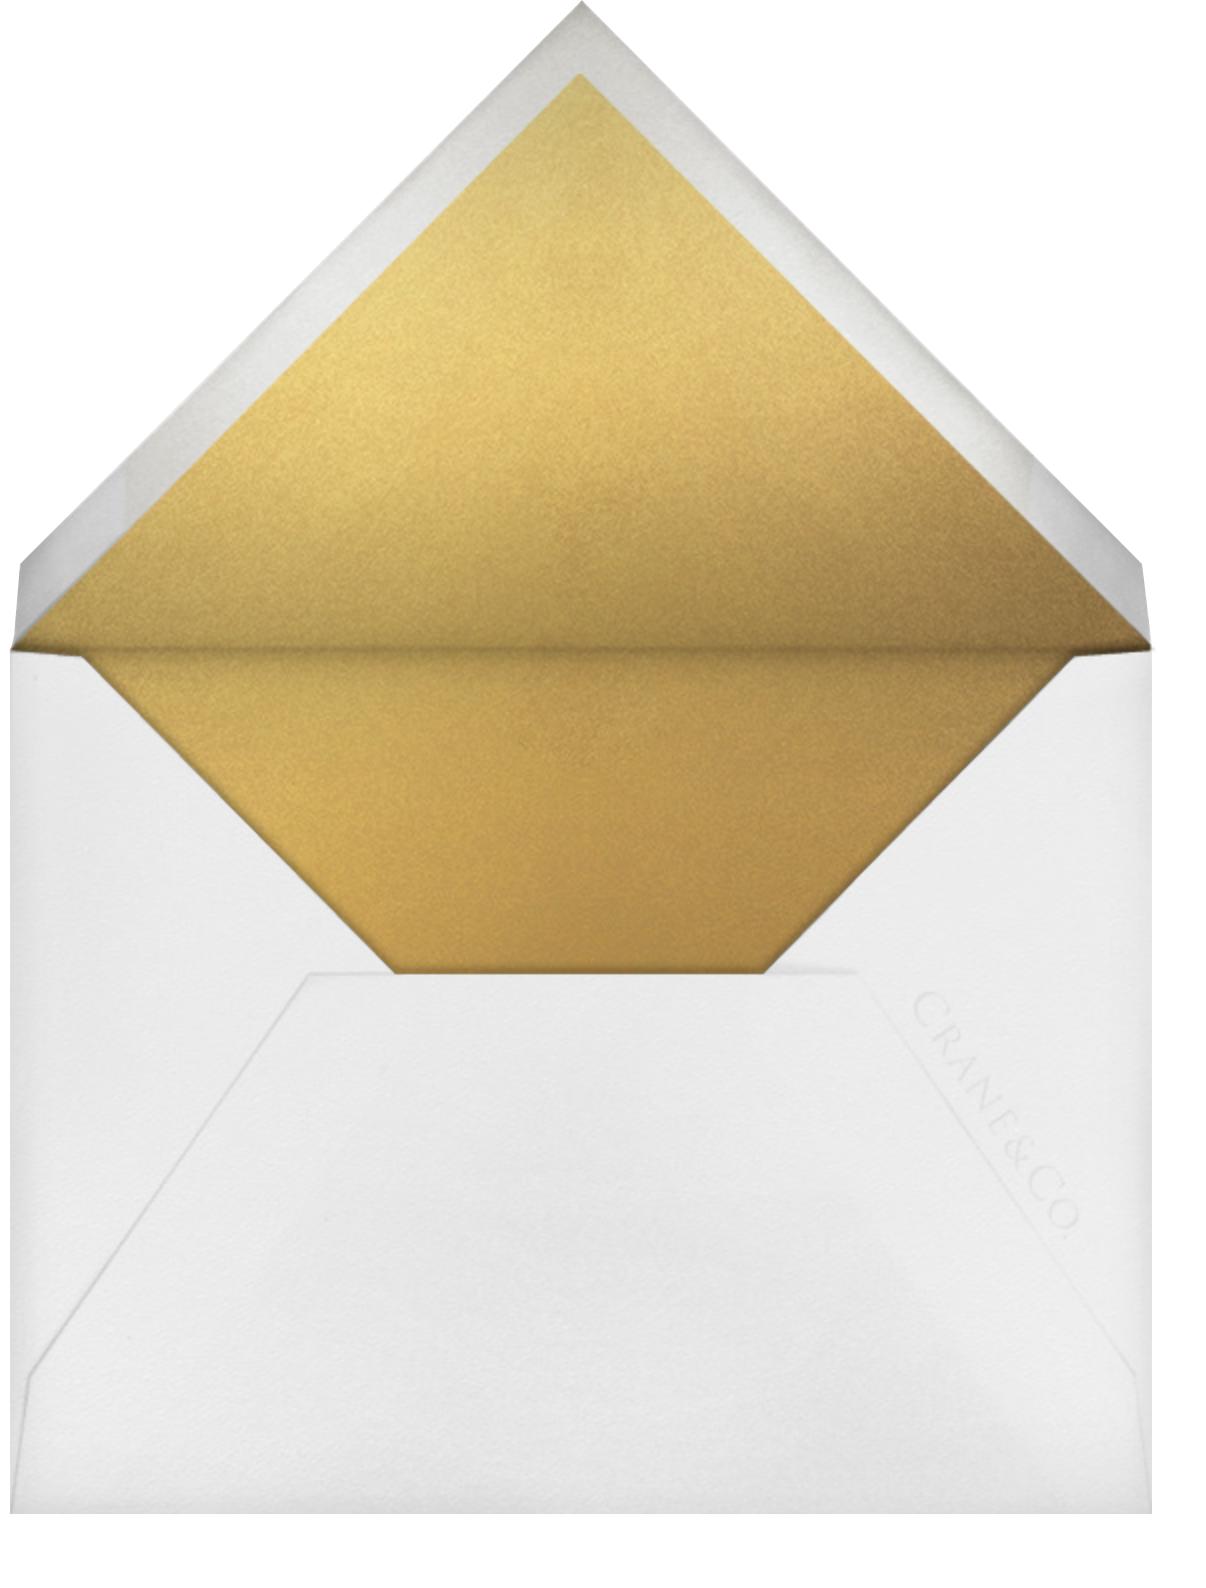 Jubilee I (Stationery) - Medium Gold - Kelly Wearstler - Personalized stationery - envelope back